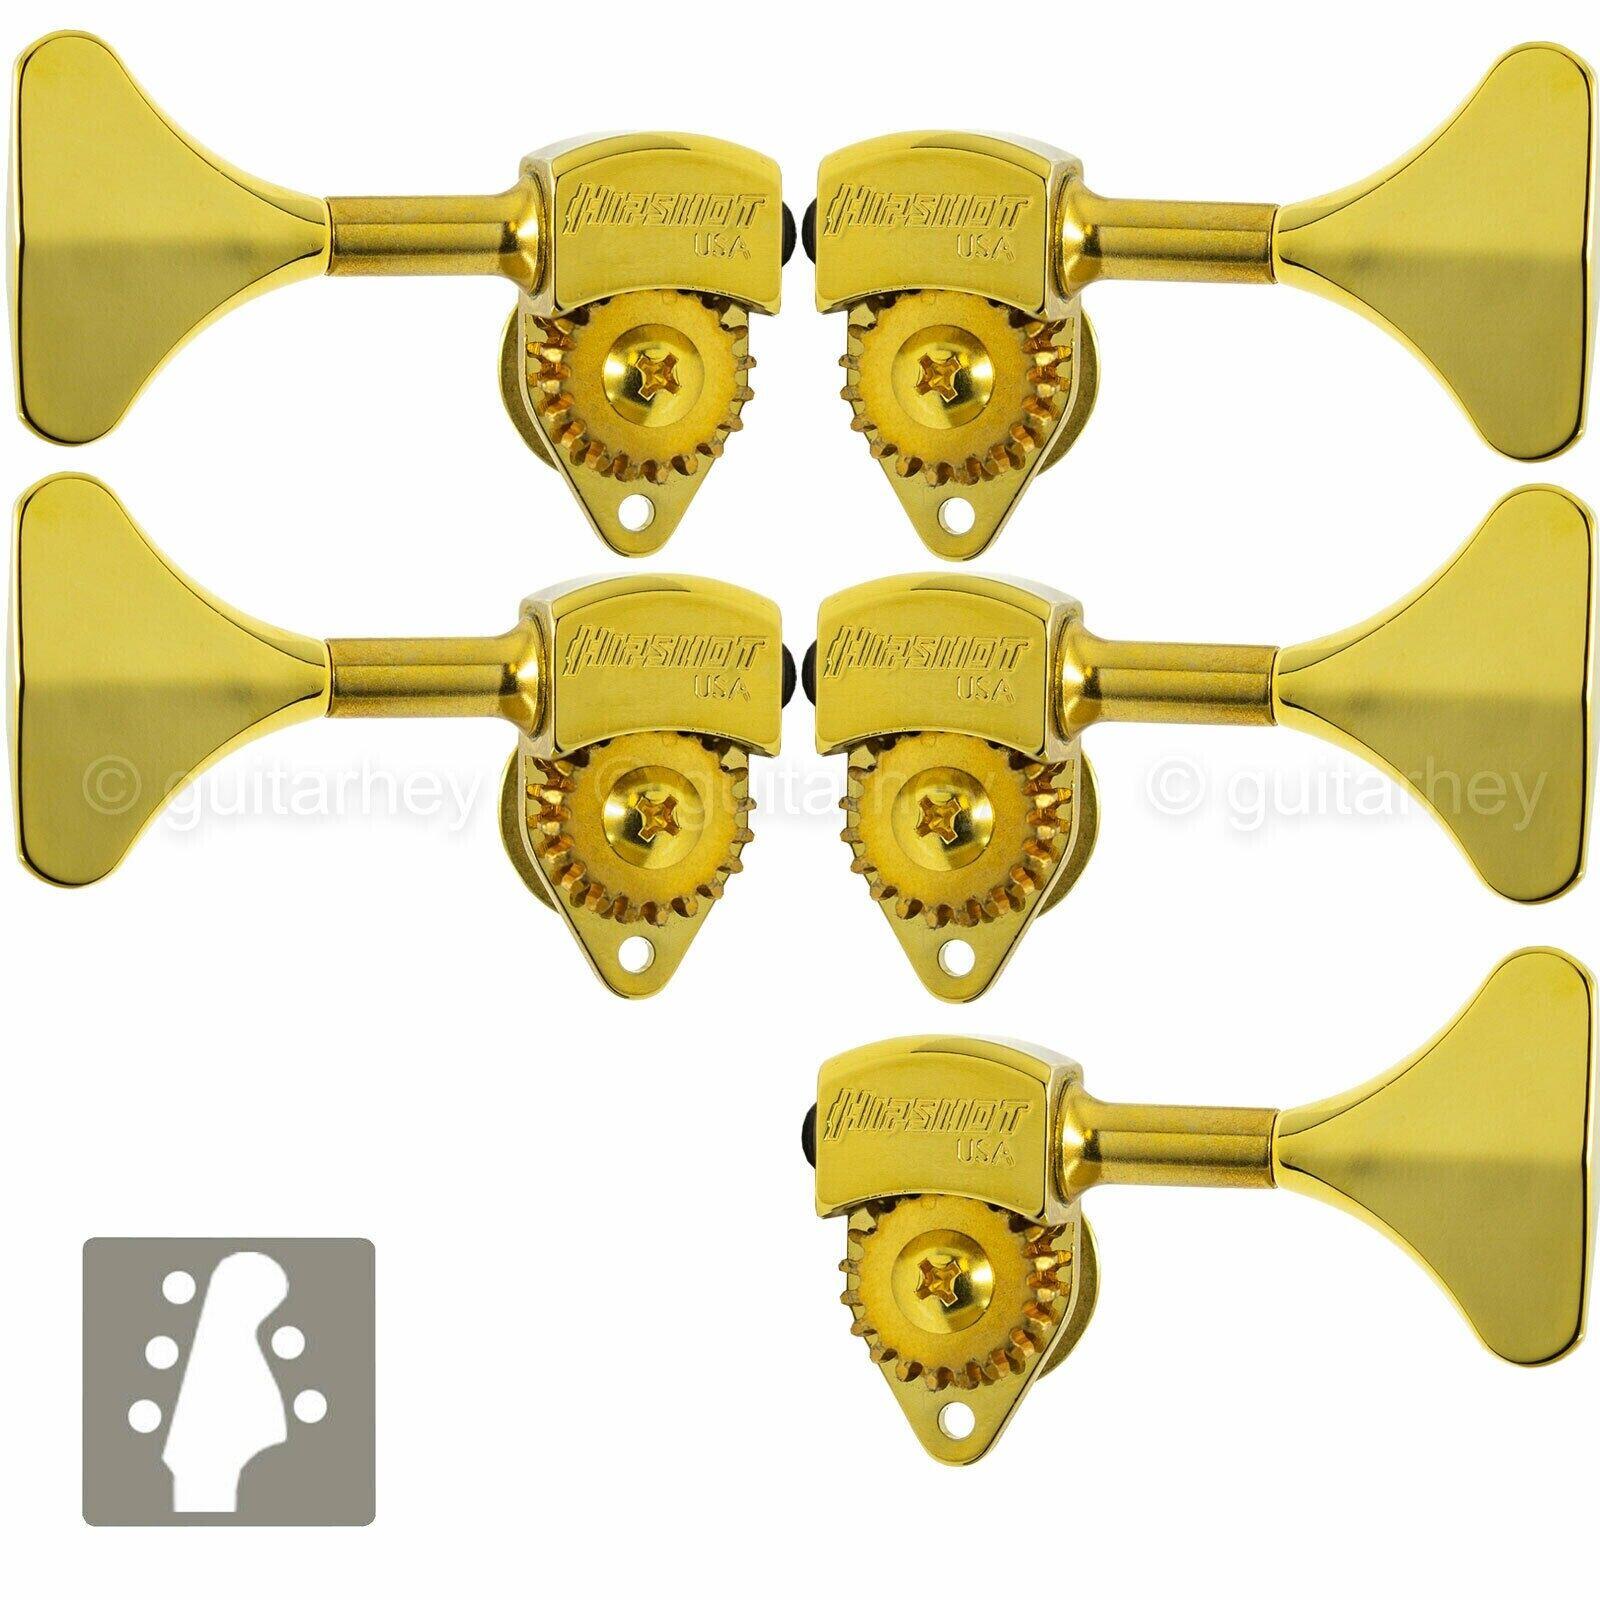 NEW Hipshot HB6 3 8  Ultralite® Bass Tuning L3+R2 Set Y Key 3x2 - Gold